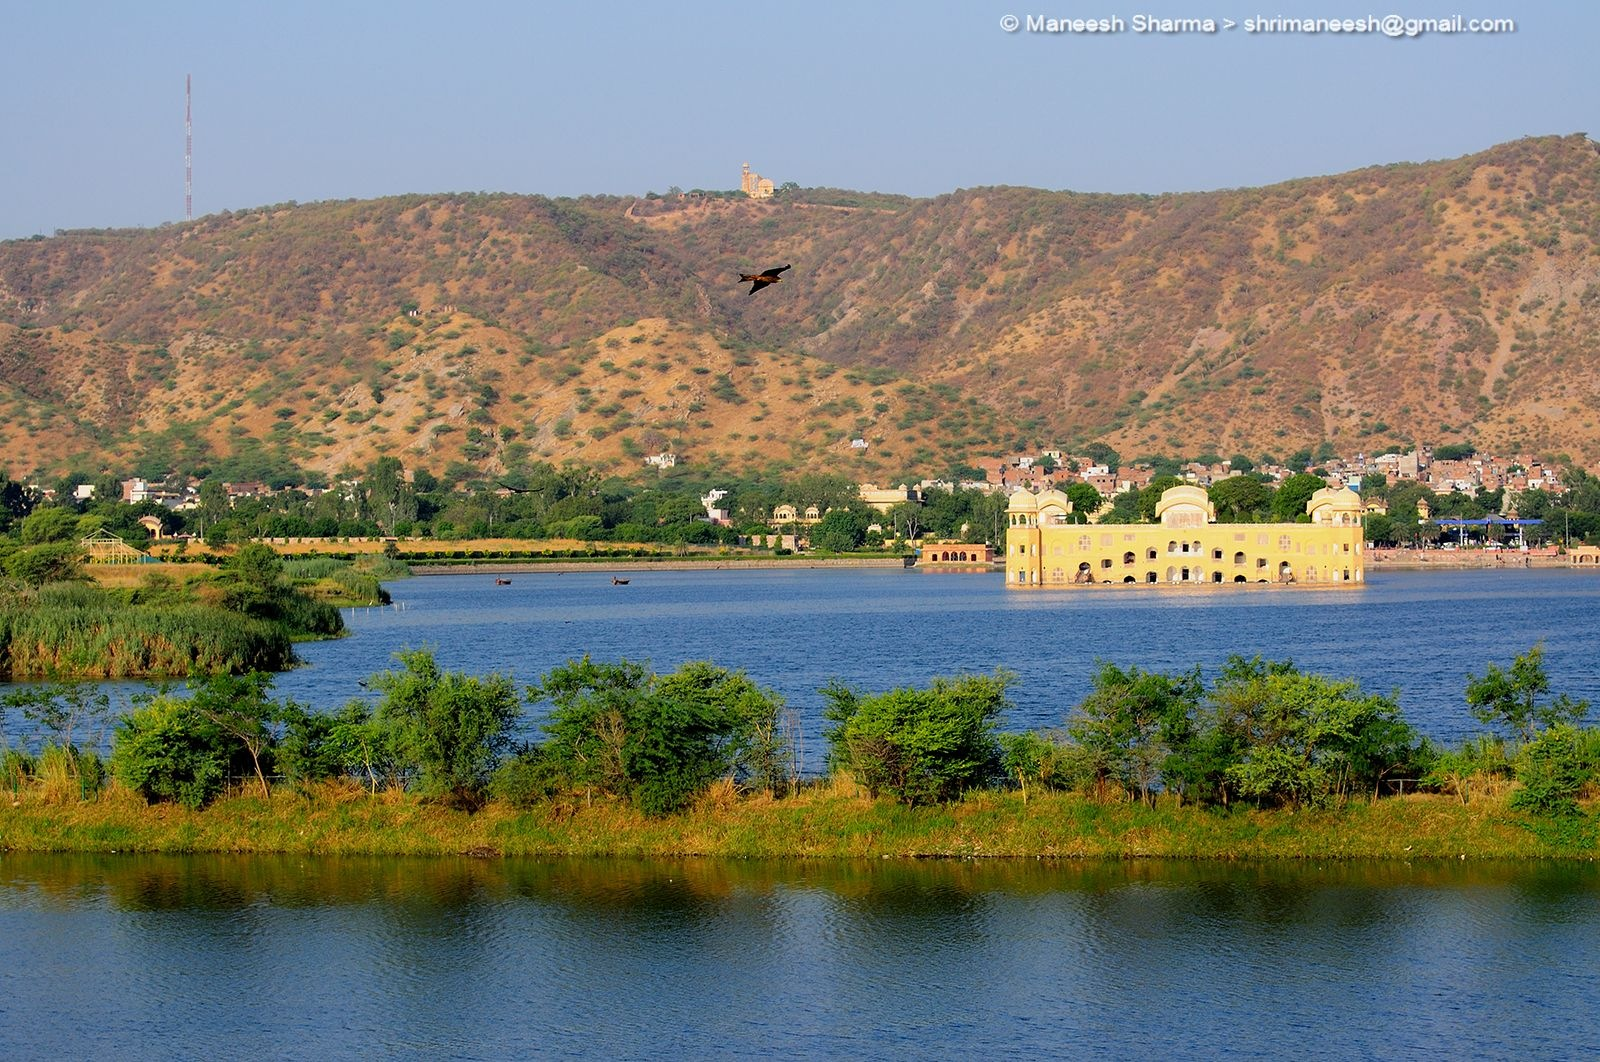 JAL MAHAL the JEWEL of Jaipur. India by Maneesh Sharma